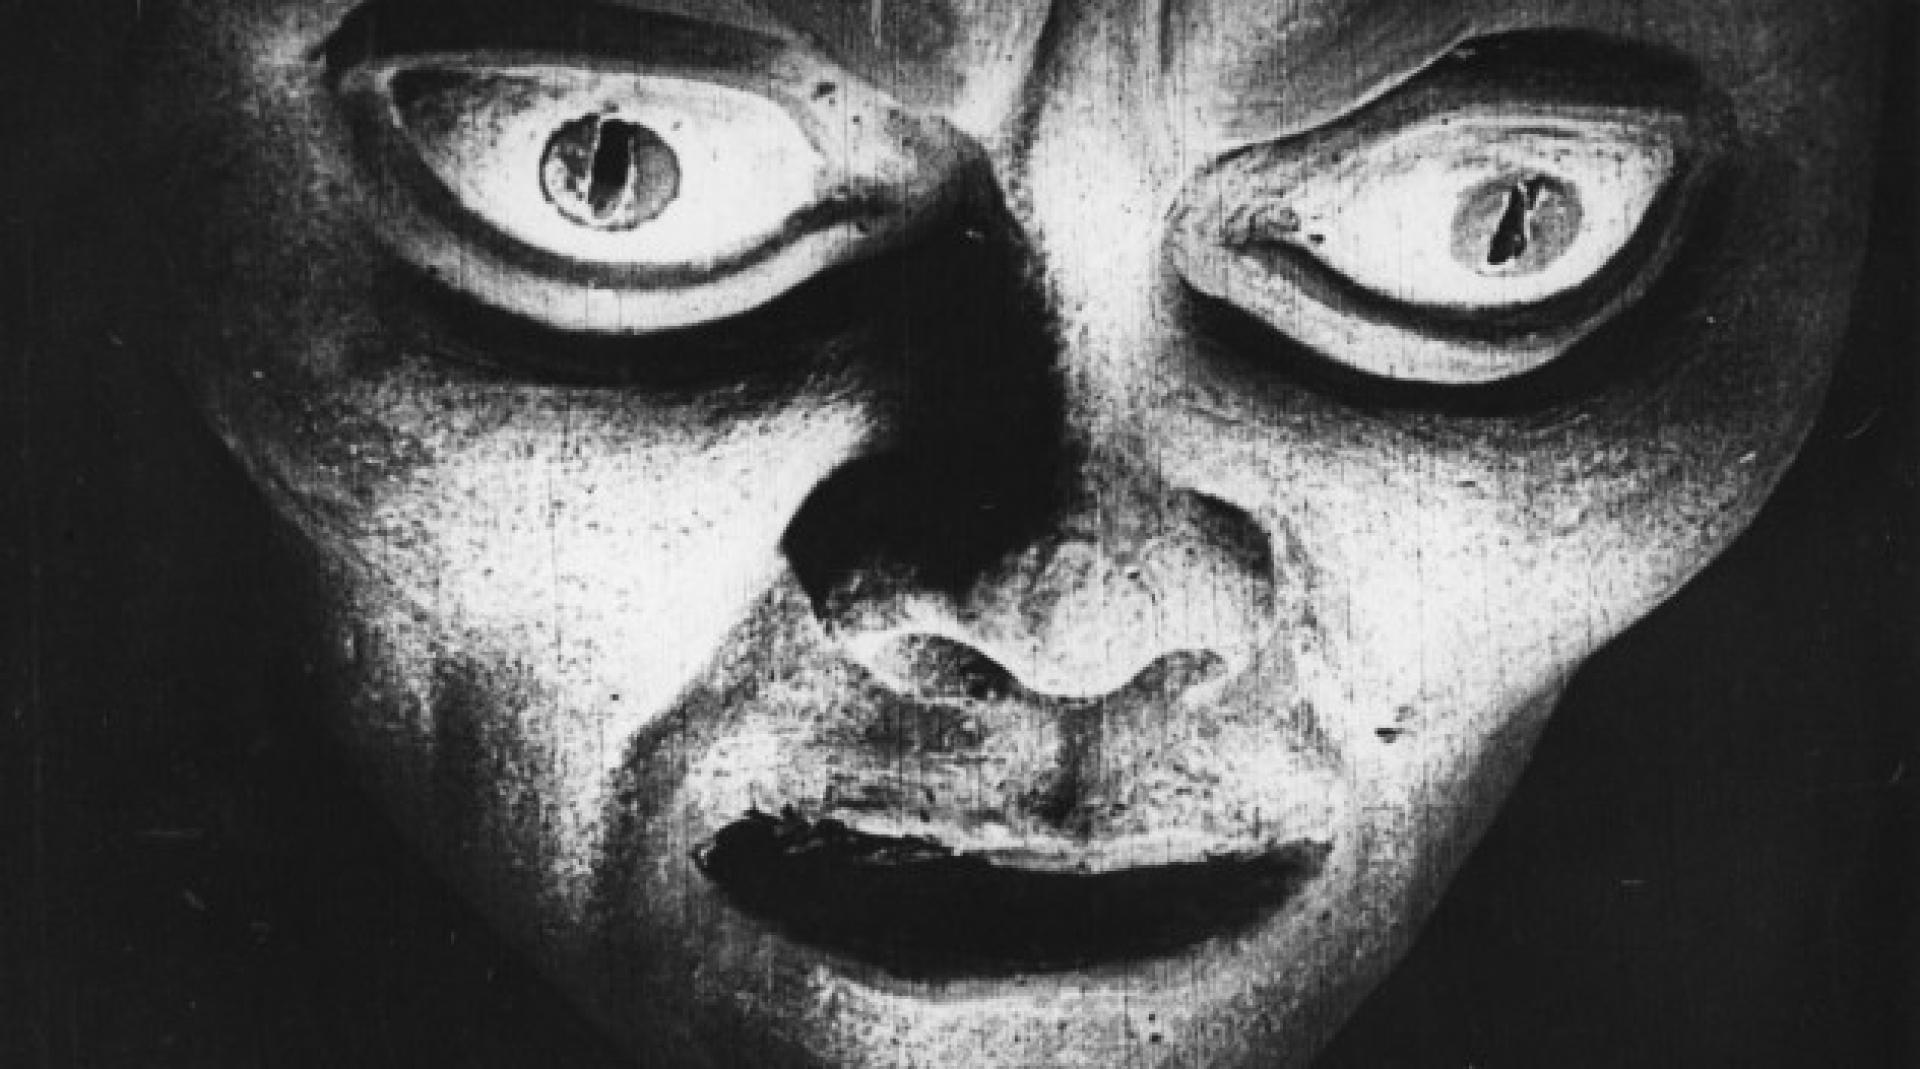 Der Golem, wie er in die Welt kam - A gólem (1920)